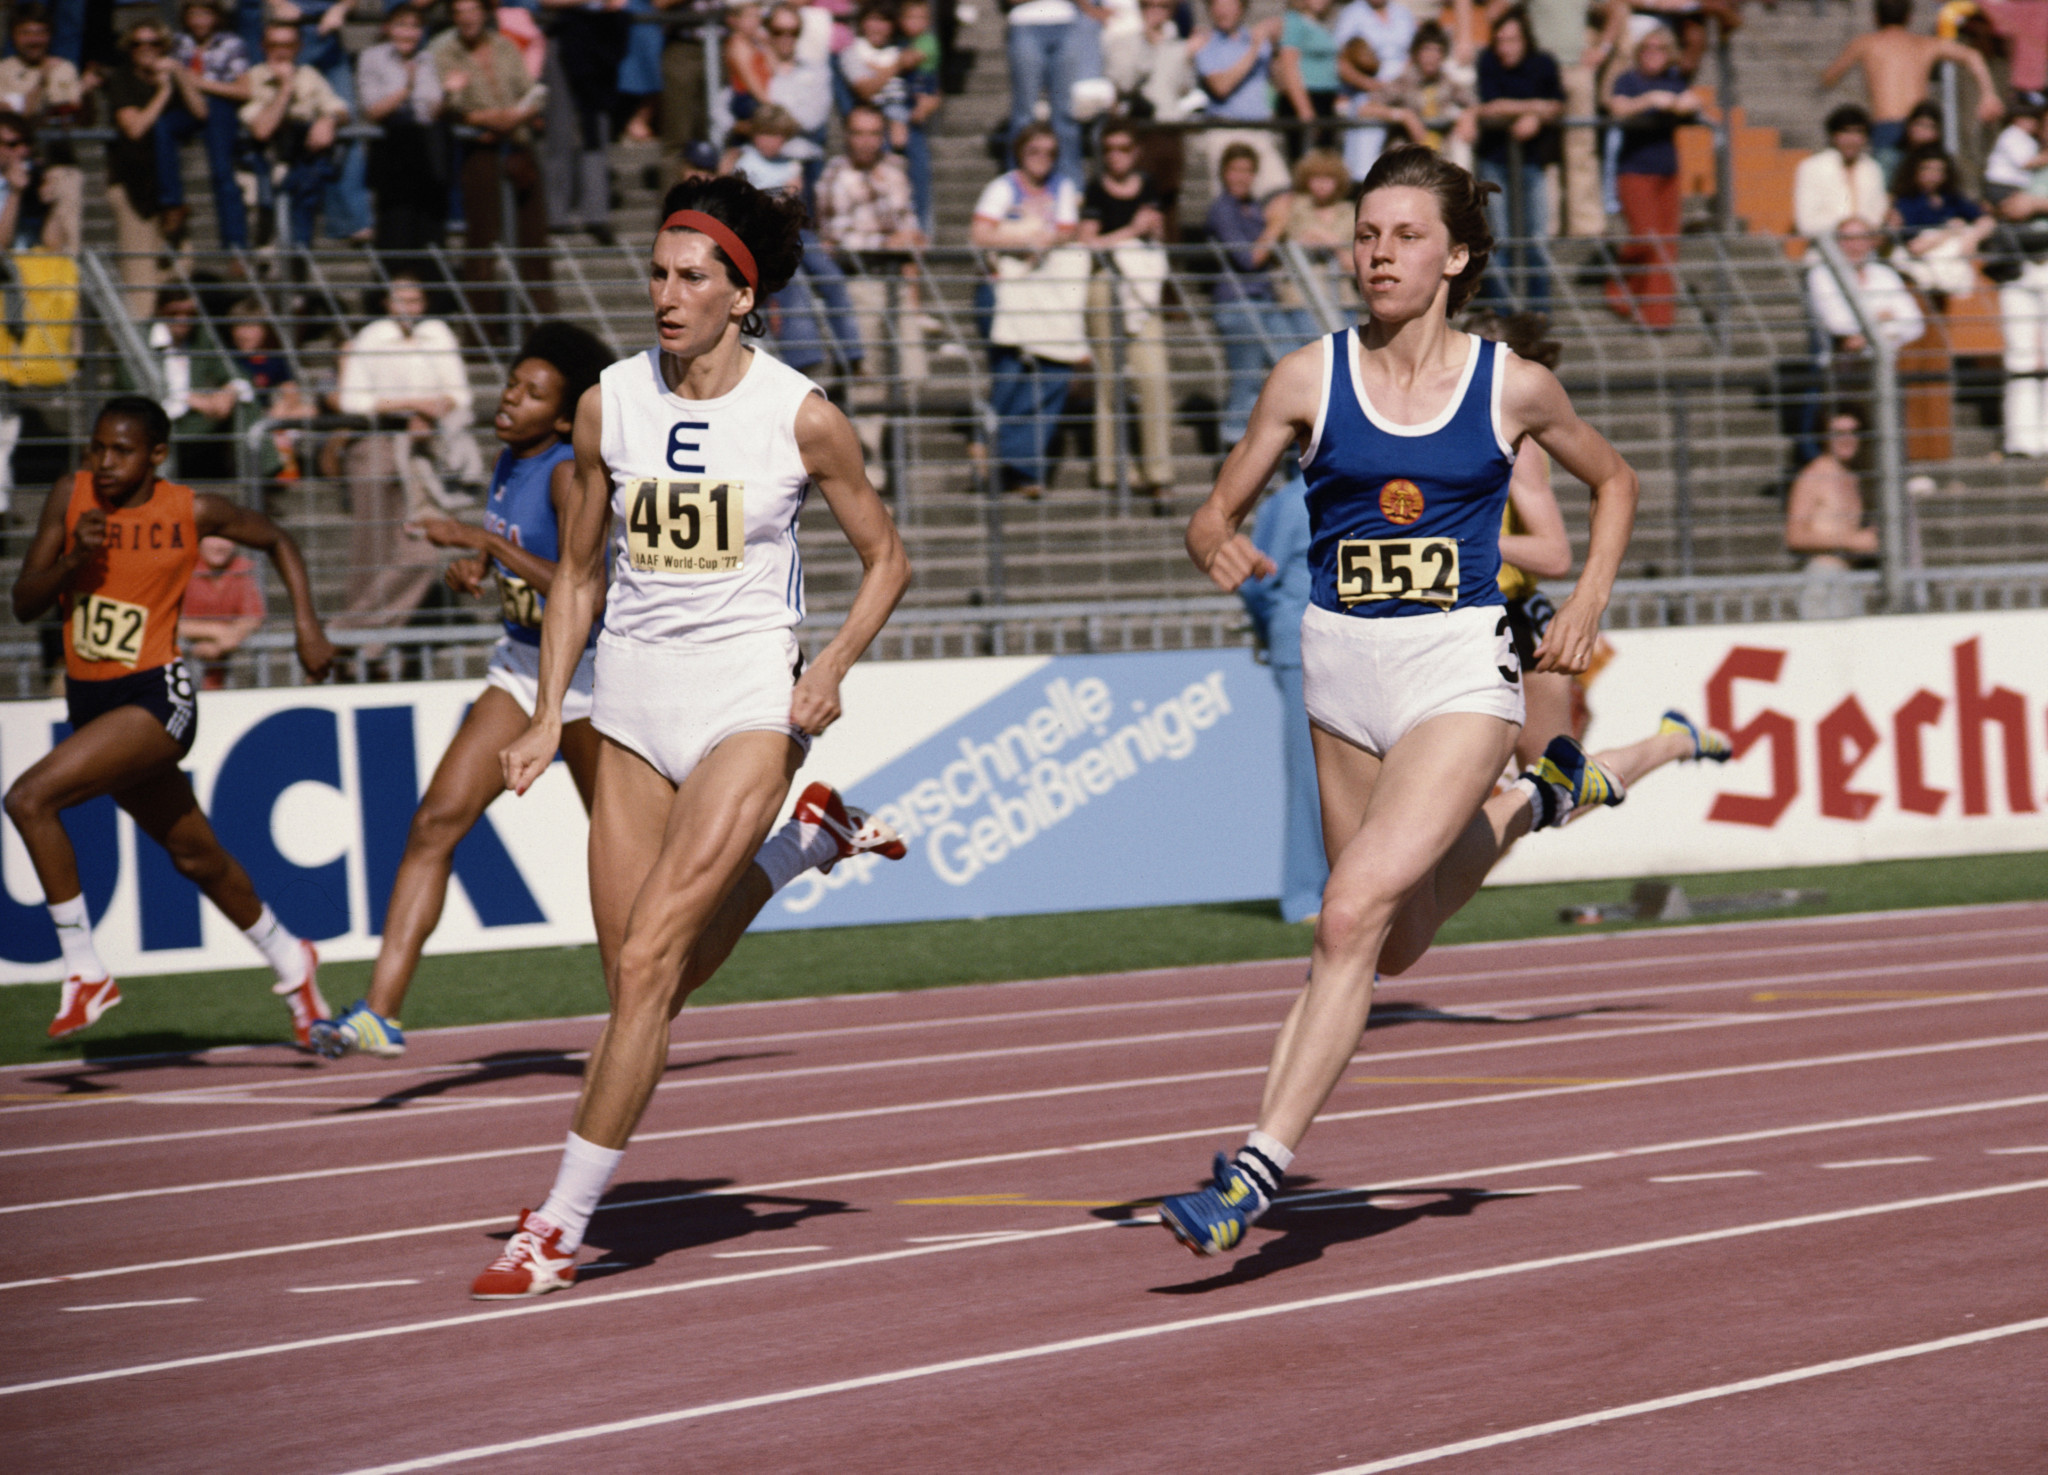 Irena Szewinska of Poland, left, races East Germany's Martia Koch in Düsseldorf ©Getty Images